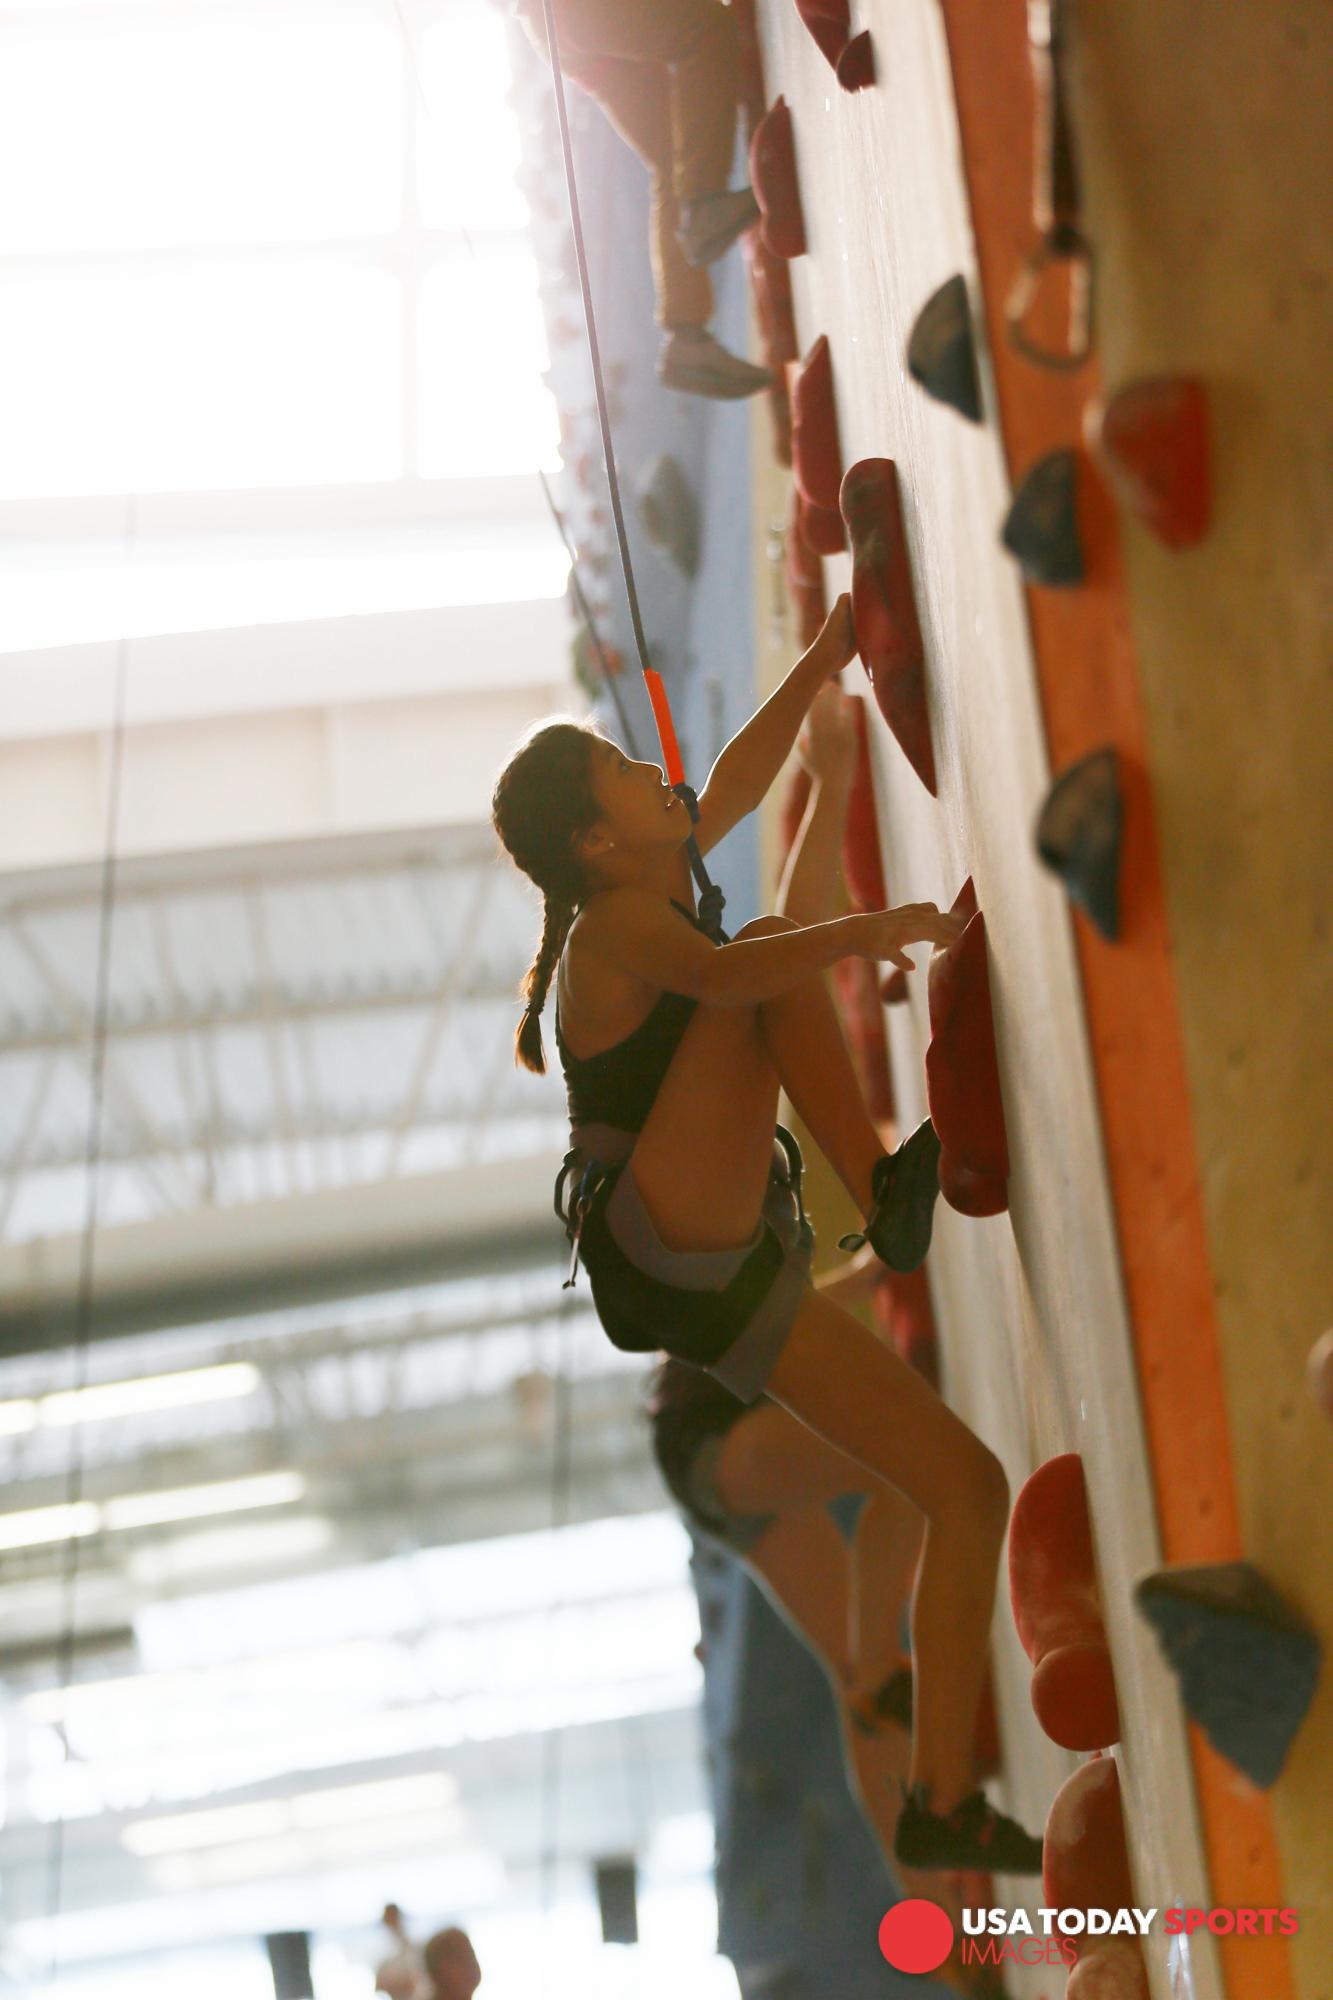 Garrett_Reid_atlanta_advertising_commercial_photographer_sport_and_speed_youth_national_chap_climbing-2.jpg